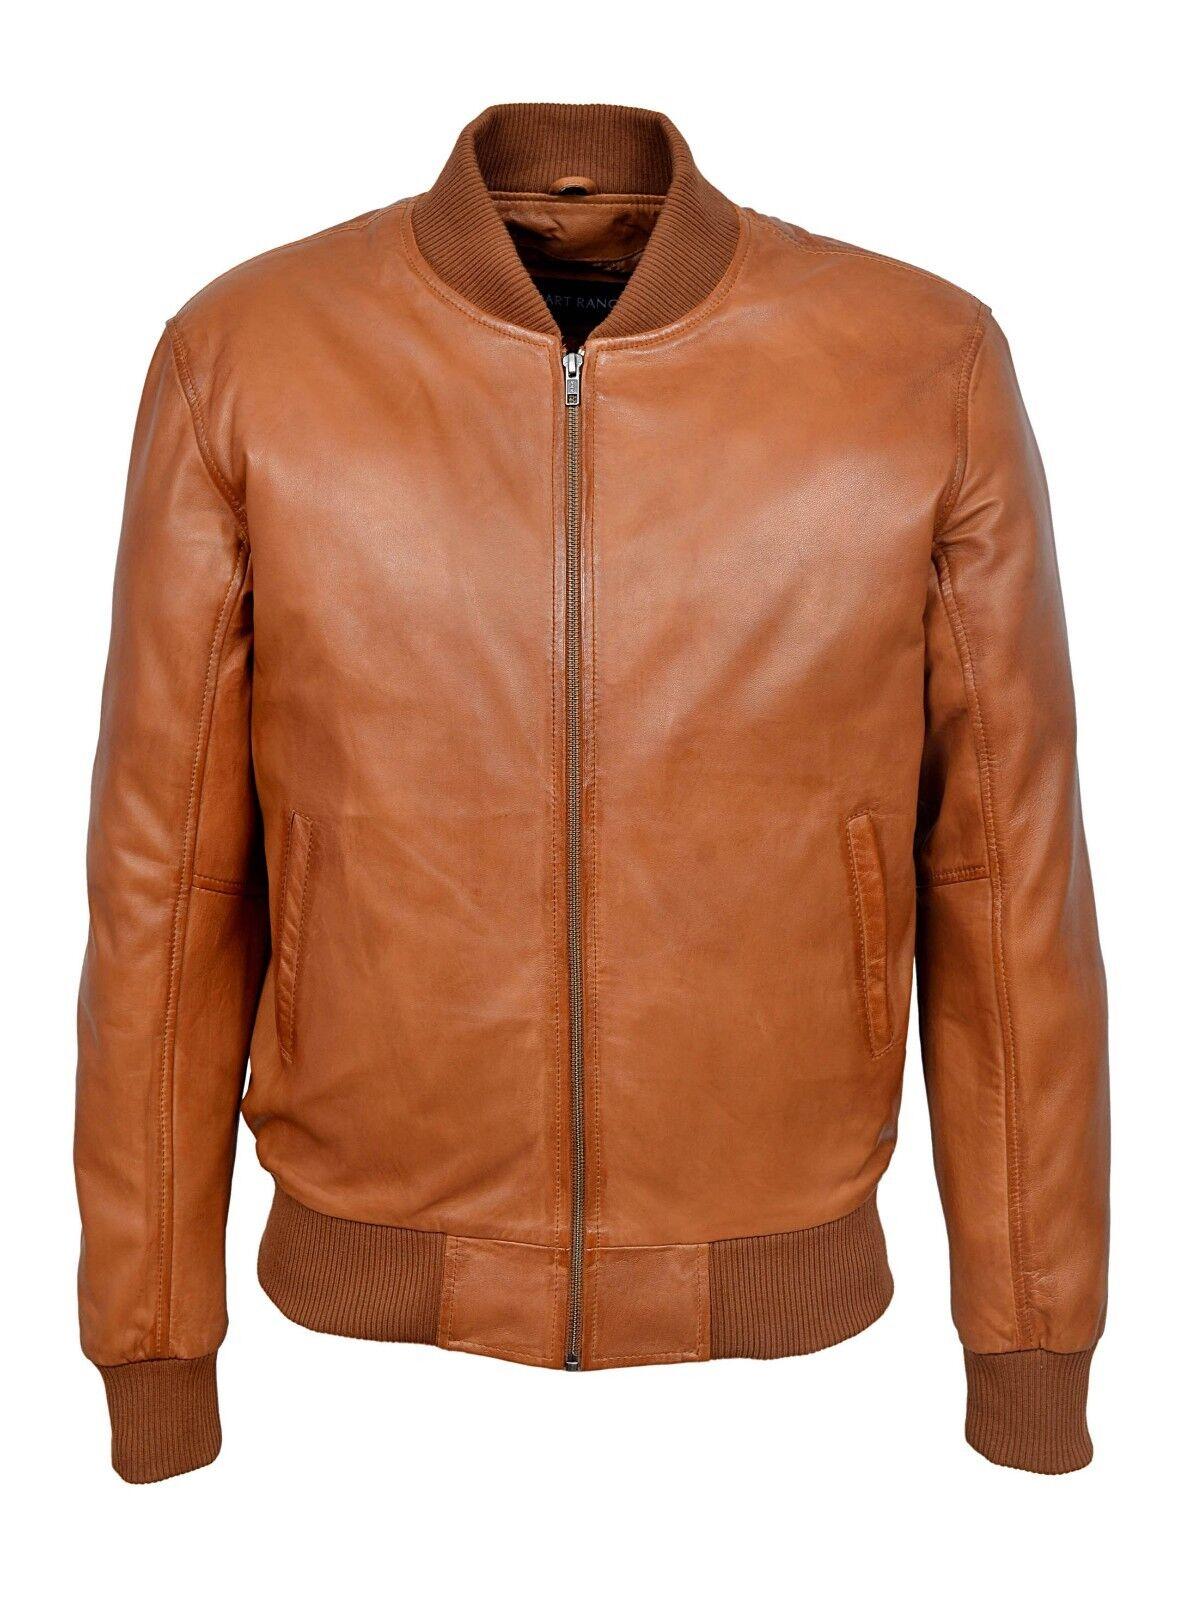 Men's Retro Leather Bomber TAN Classic Style 80'S Italian Soft Nappa Leather New